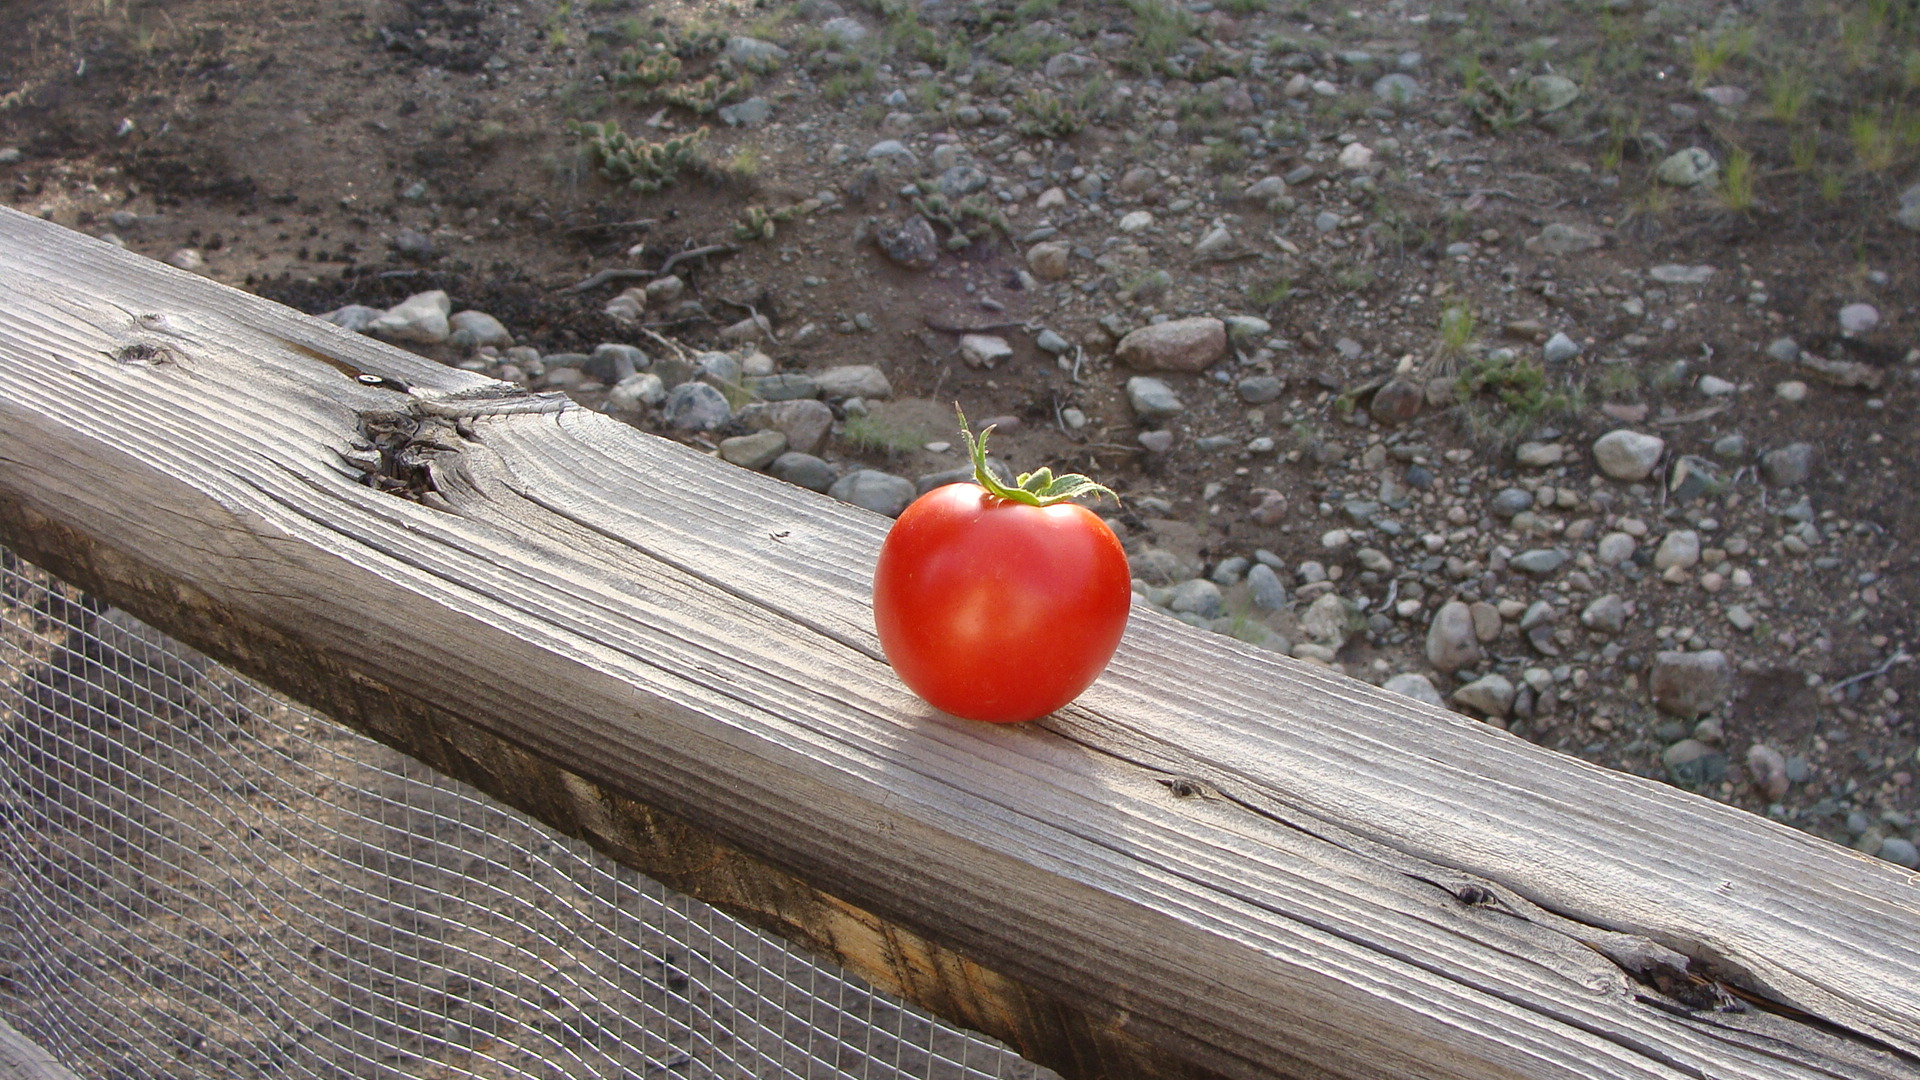 tomato in the sunlight